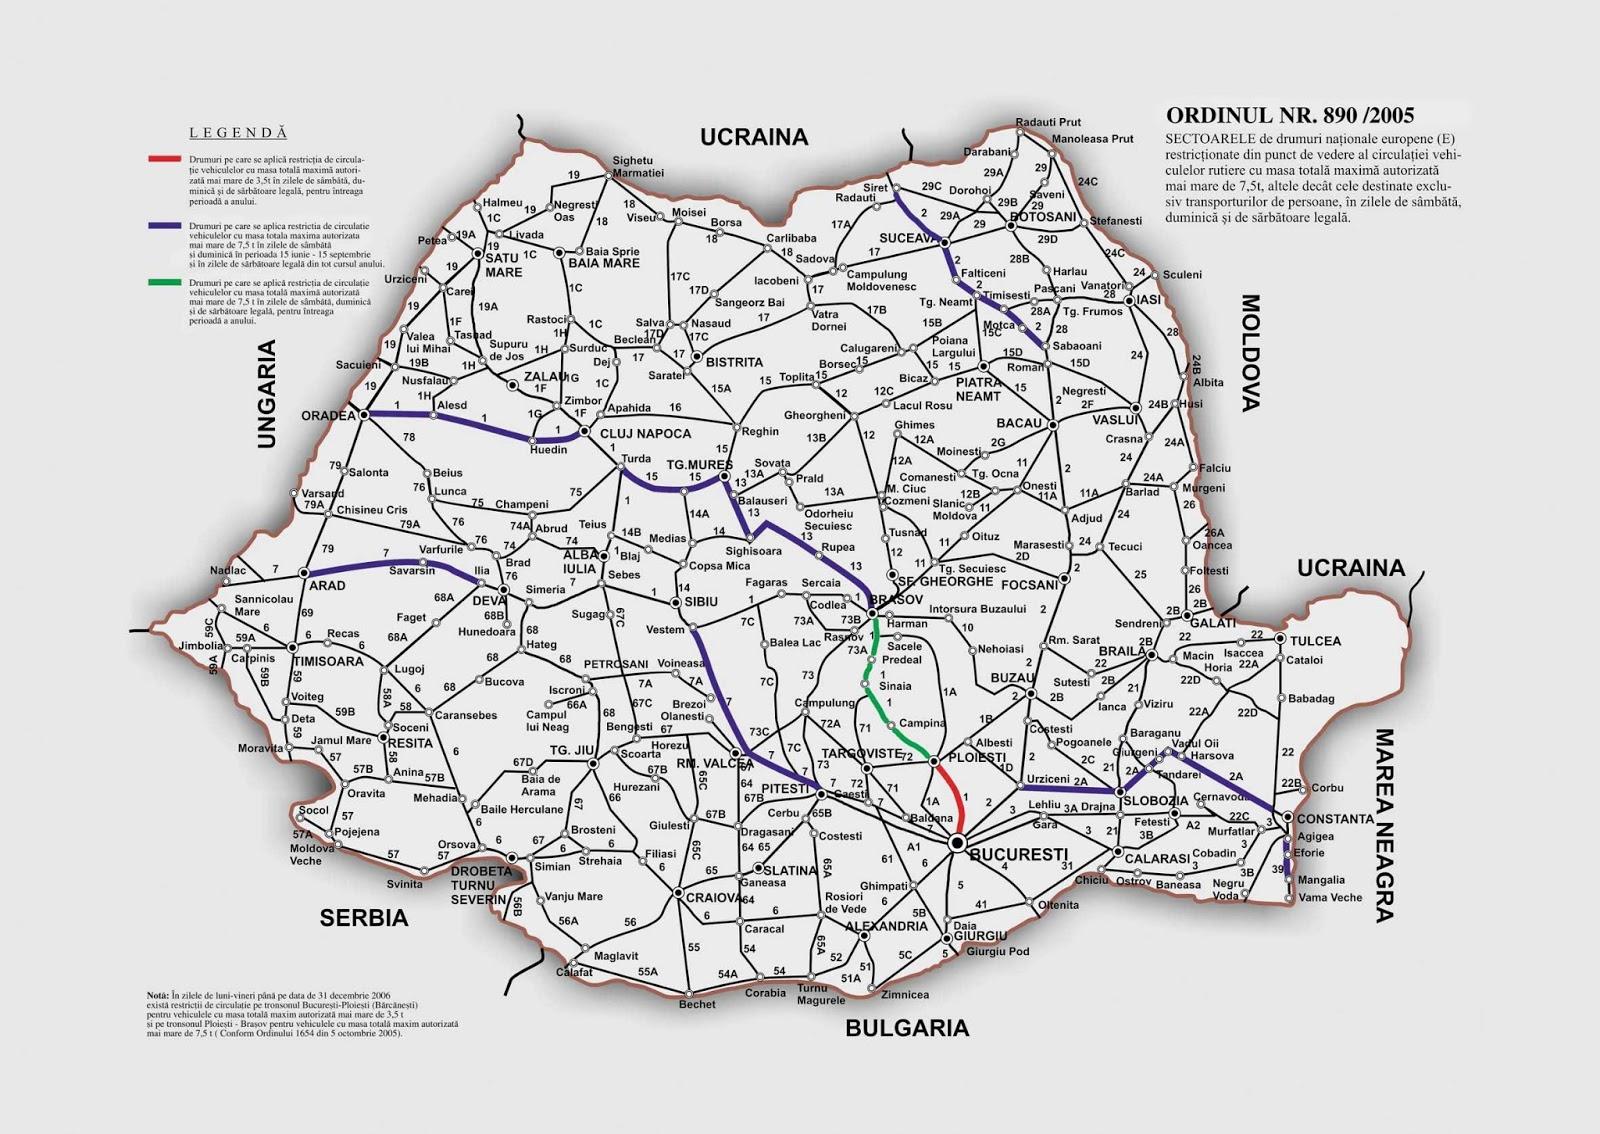 Harta Rutiera A Romaniei Detaliata Harta Romaniei Rutiera Detaliata